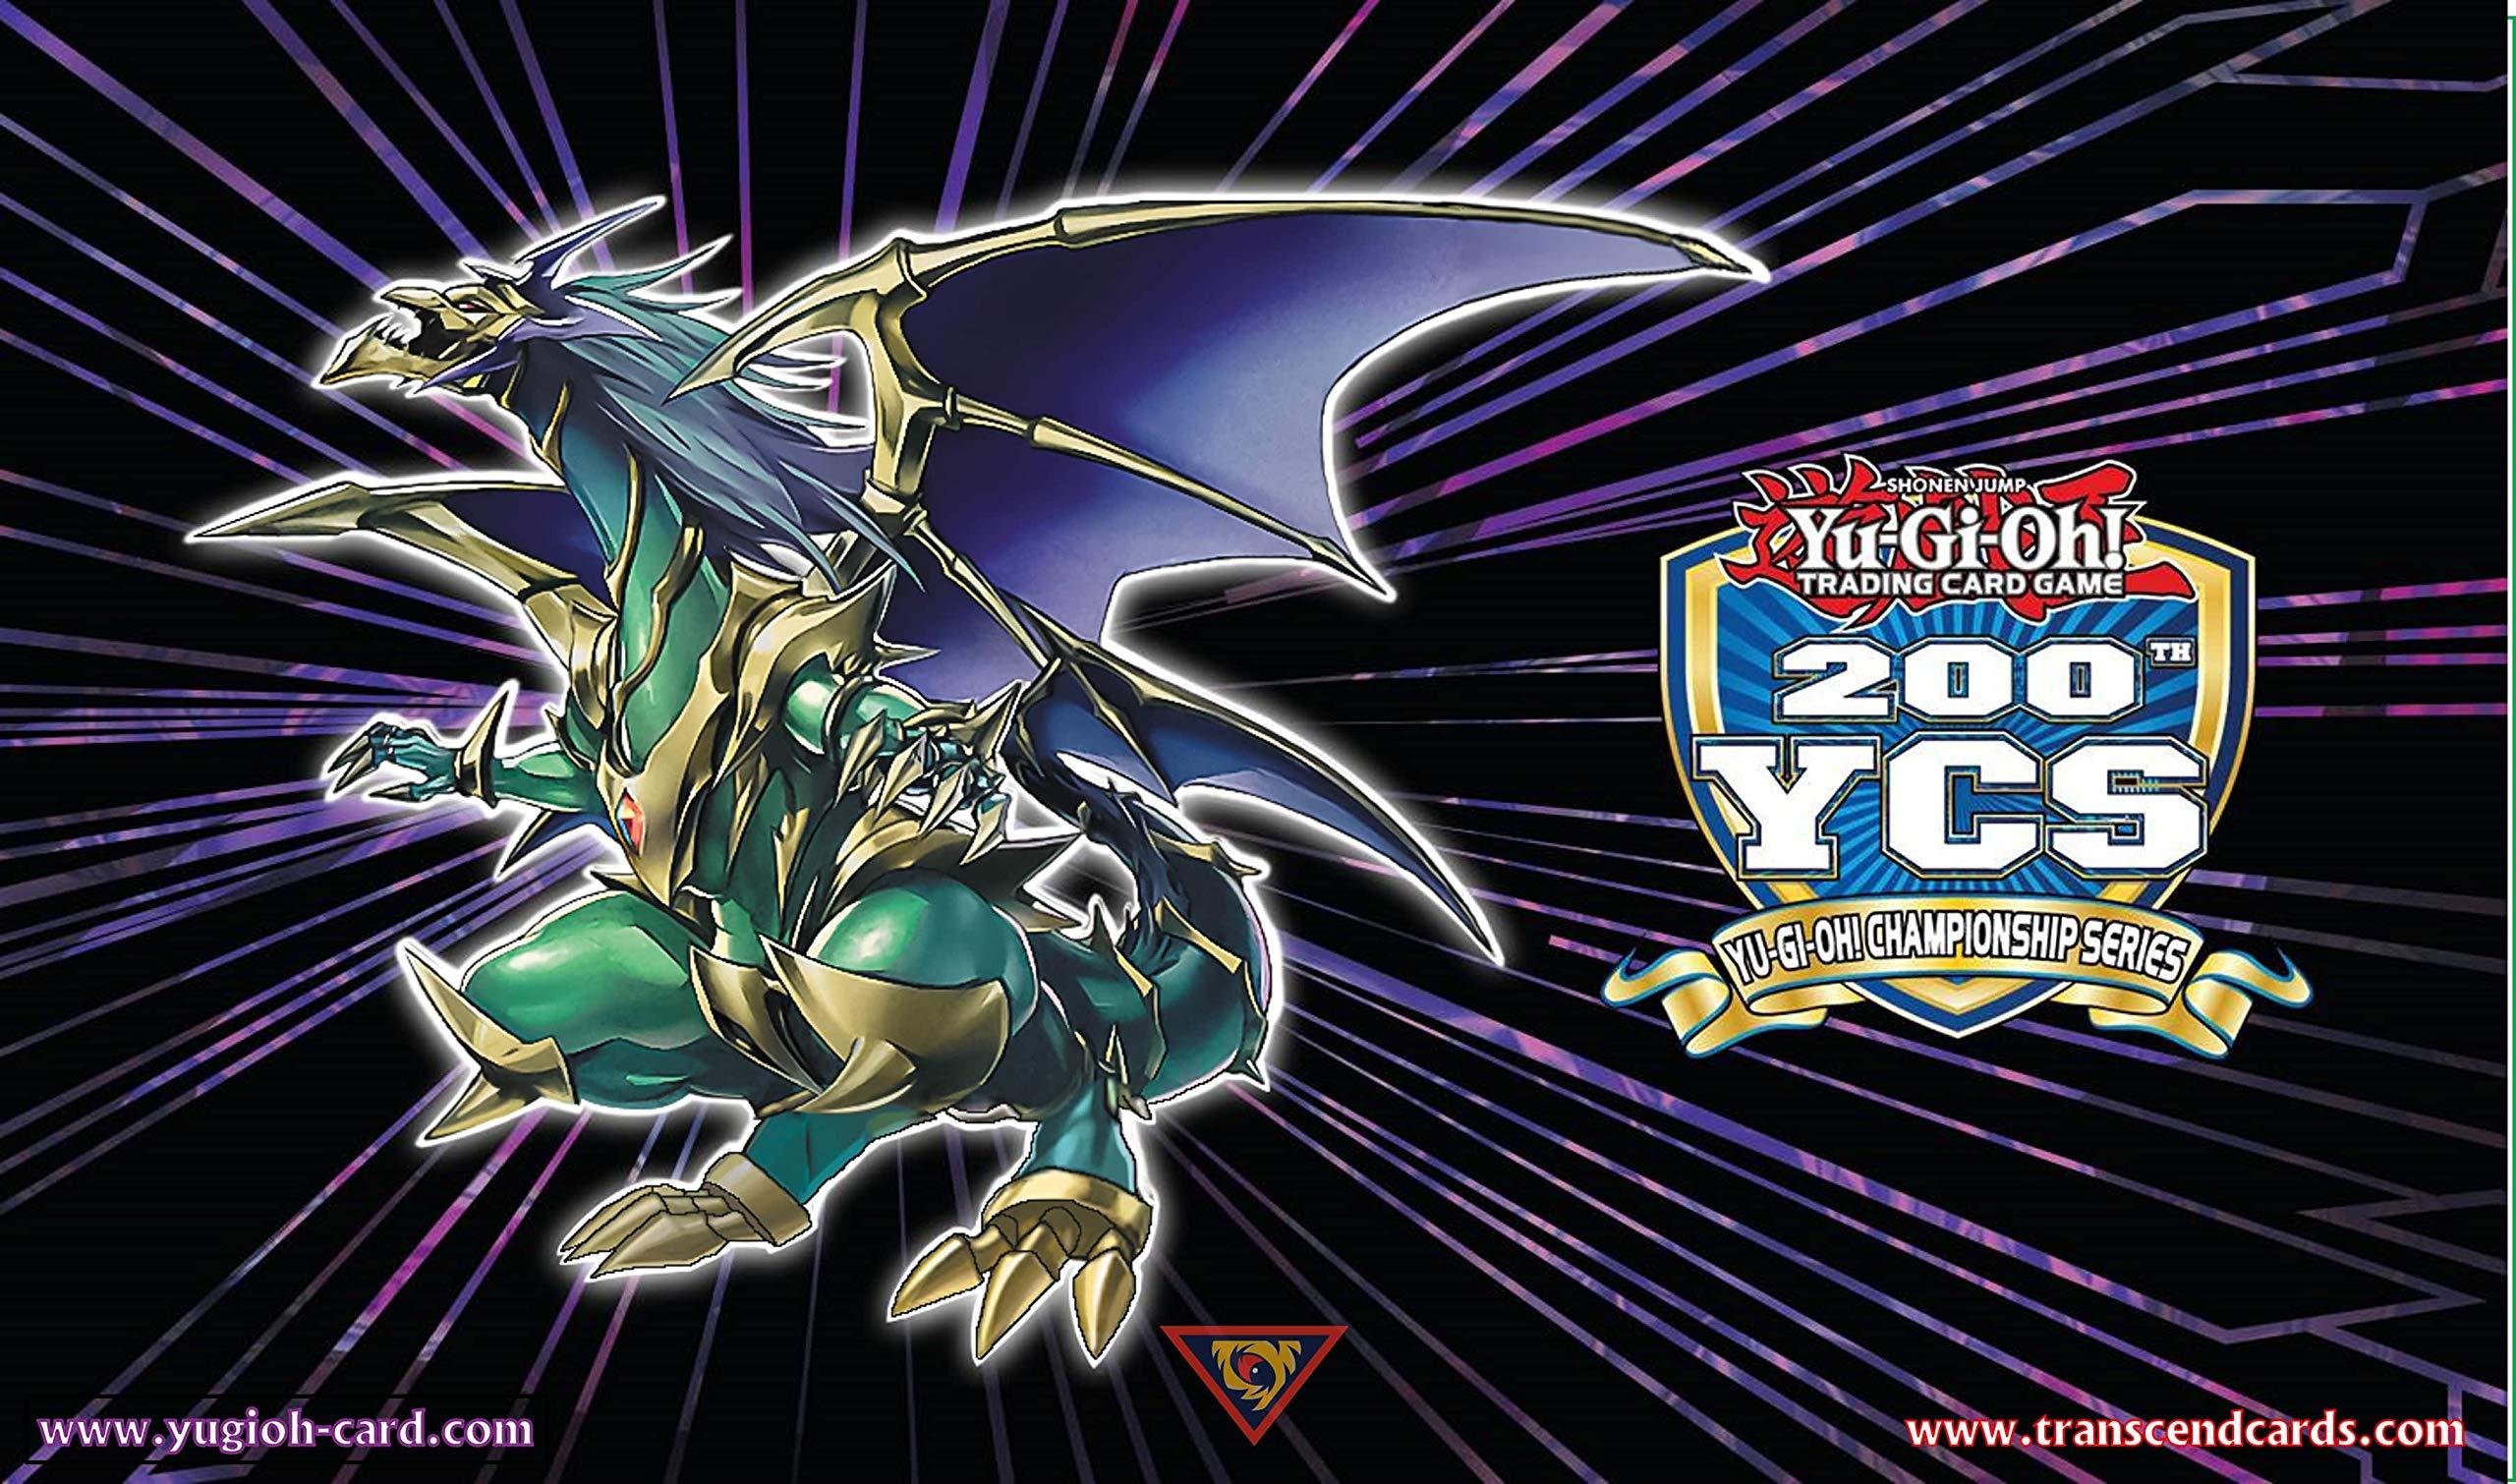 Playmat: Chaos Emperor, The Dragon of Armageddon (YCS 200 Topcut 64 Replica)